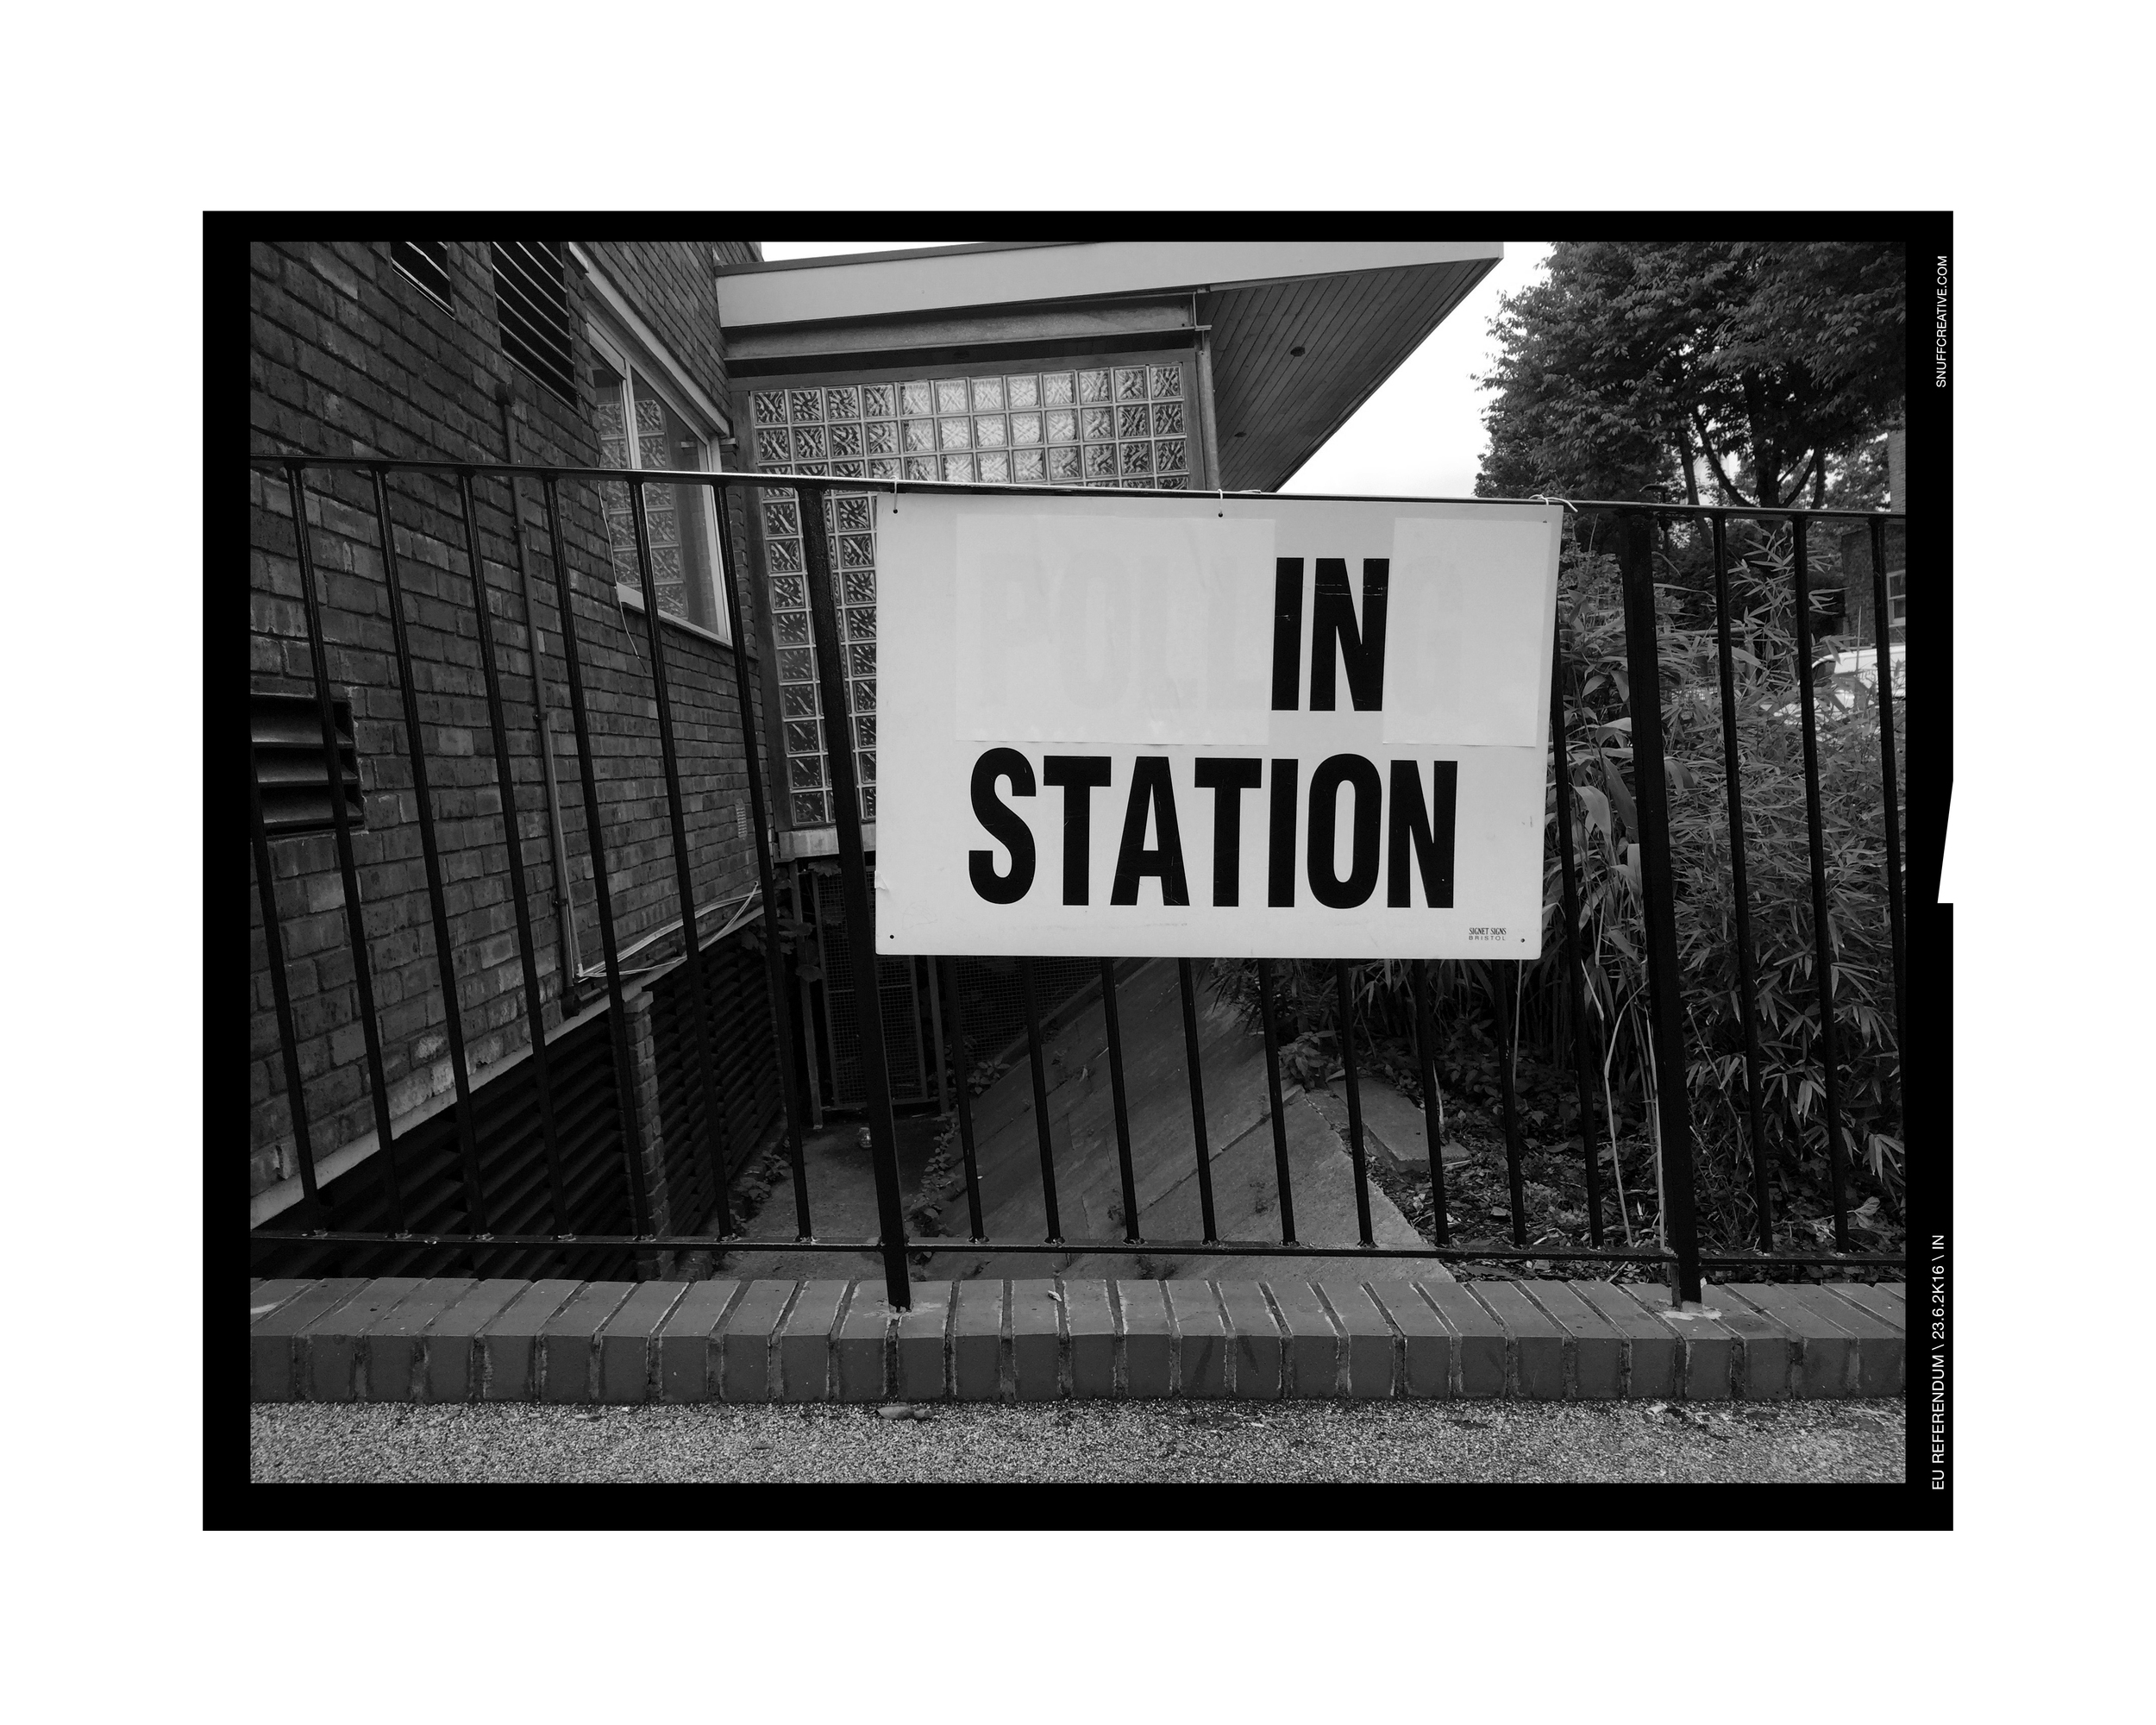 IN STATION-EU REFERENDUMgrey3-SNUFFCREATIVE2016.jpg